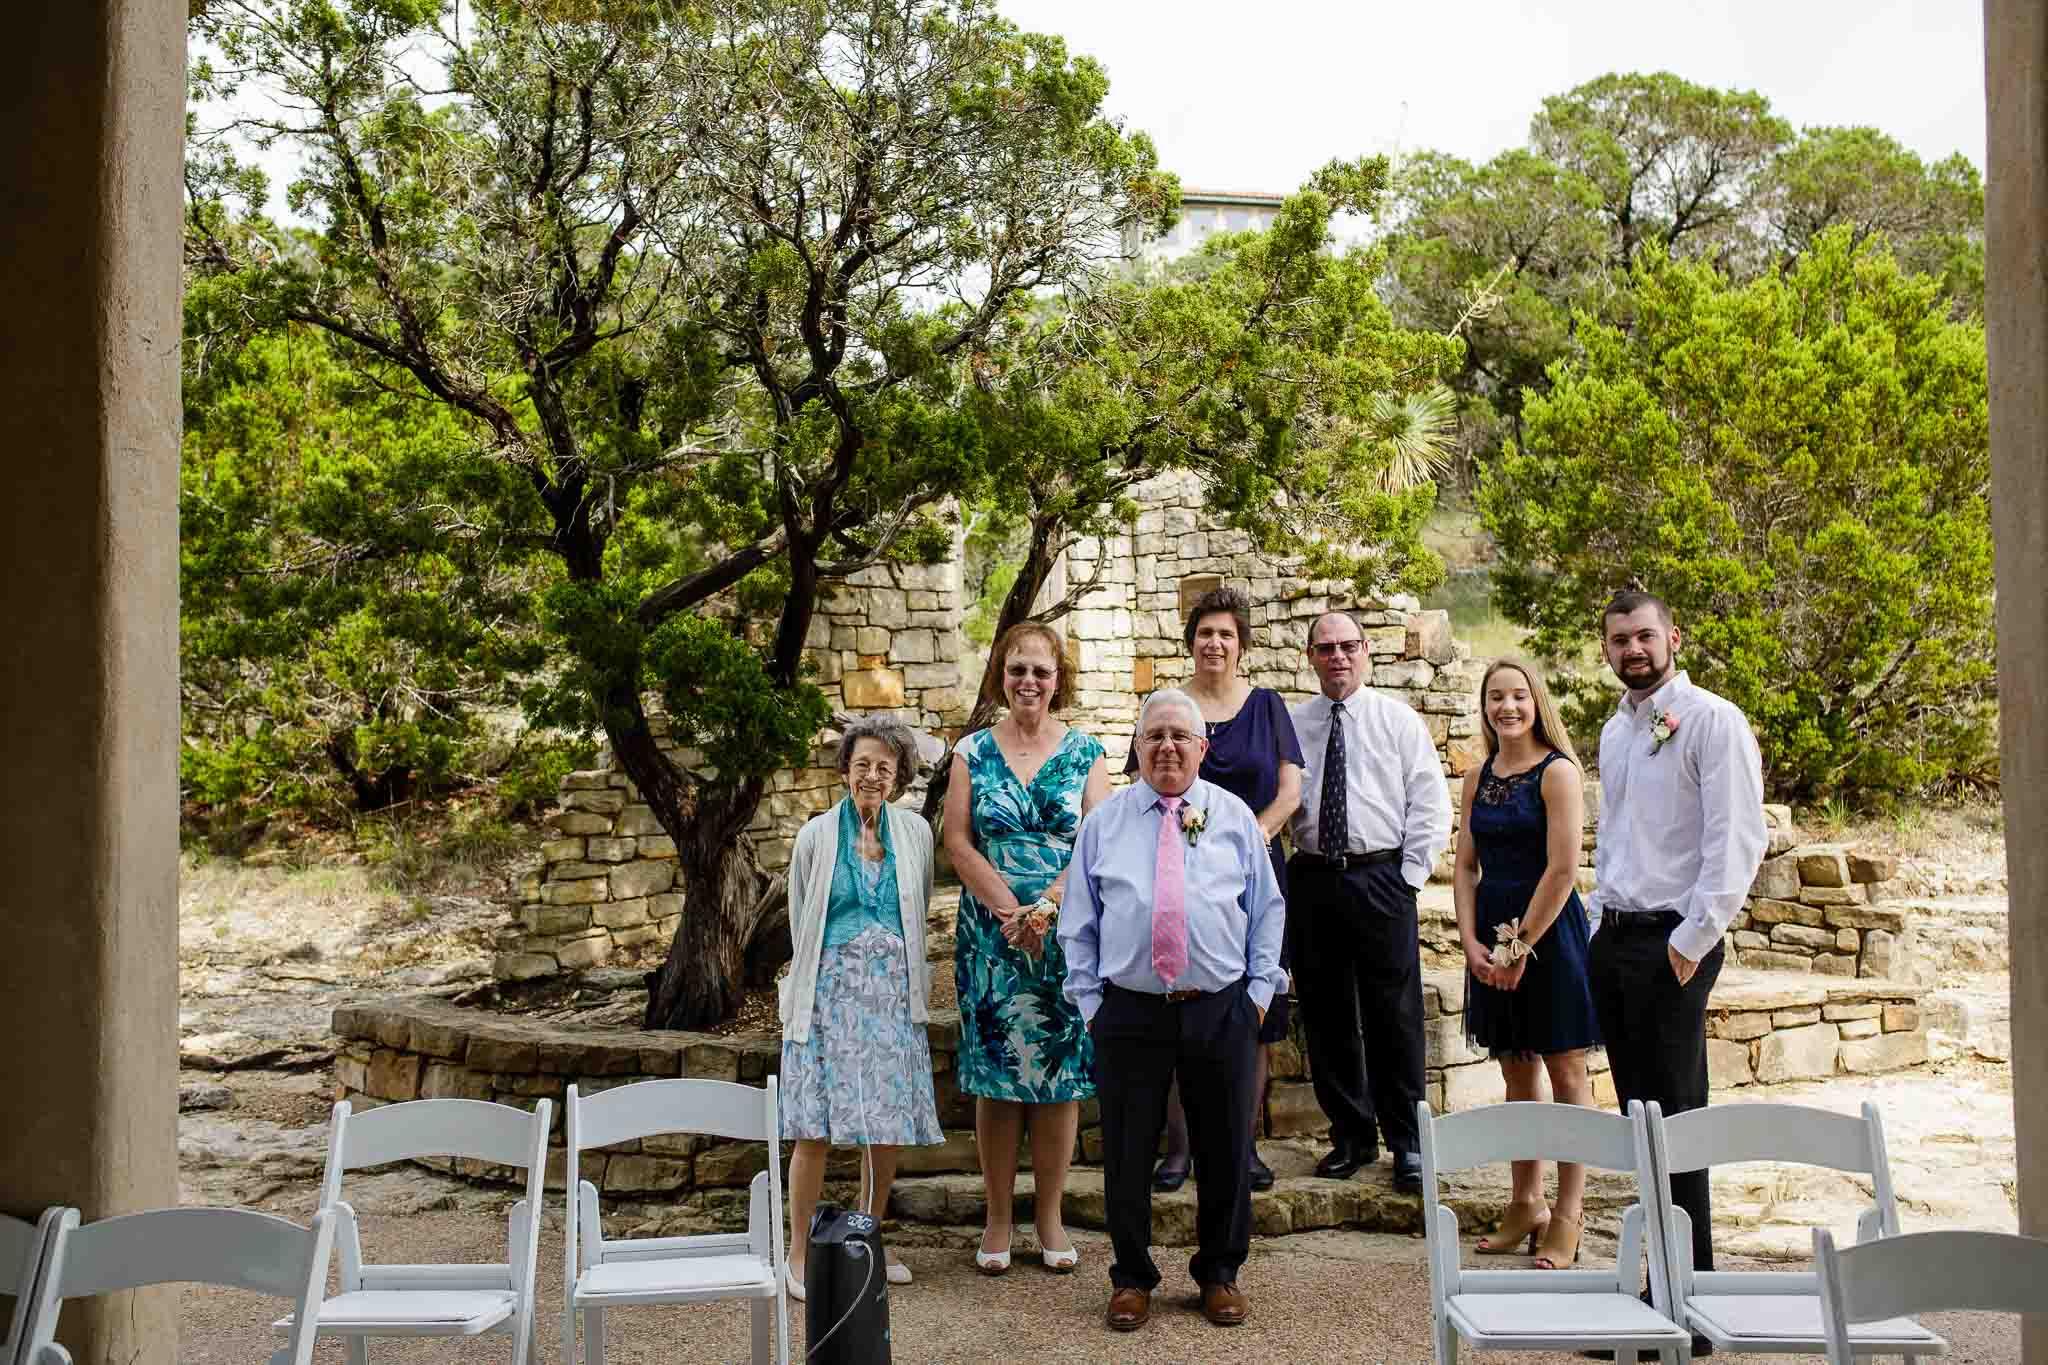 chapel-dulcinea-wedding-11.jpg